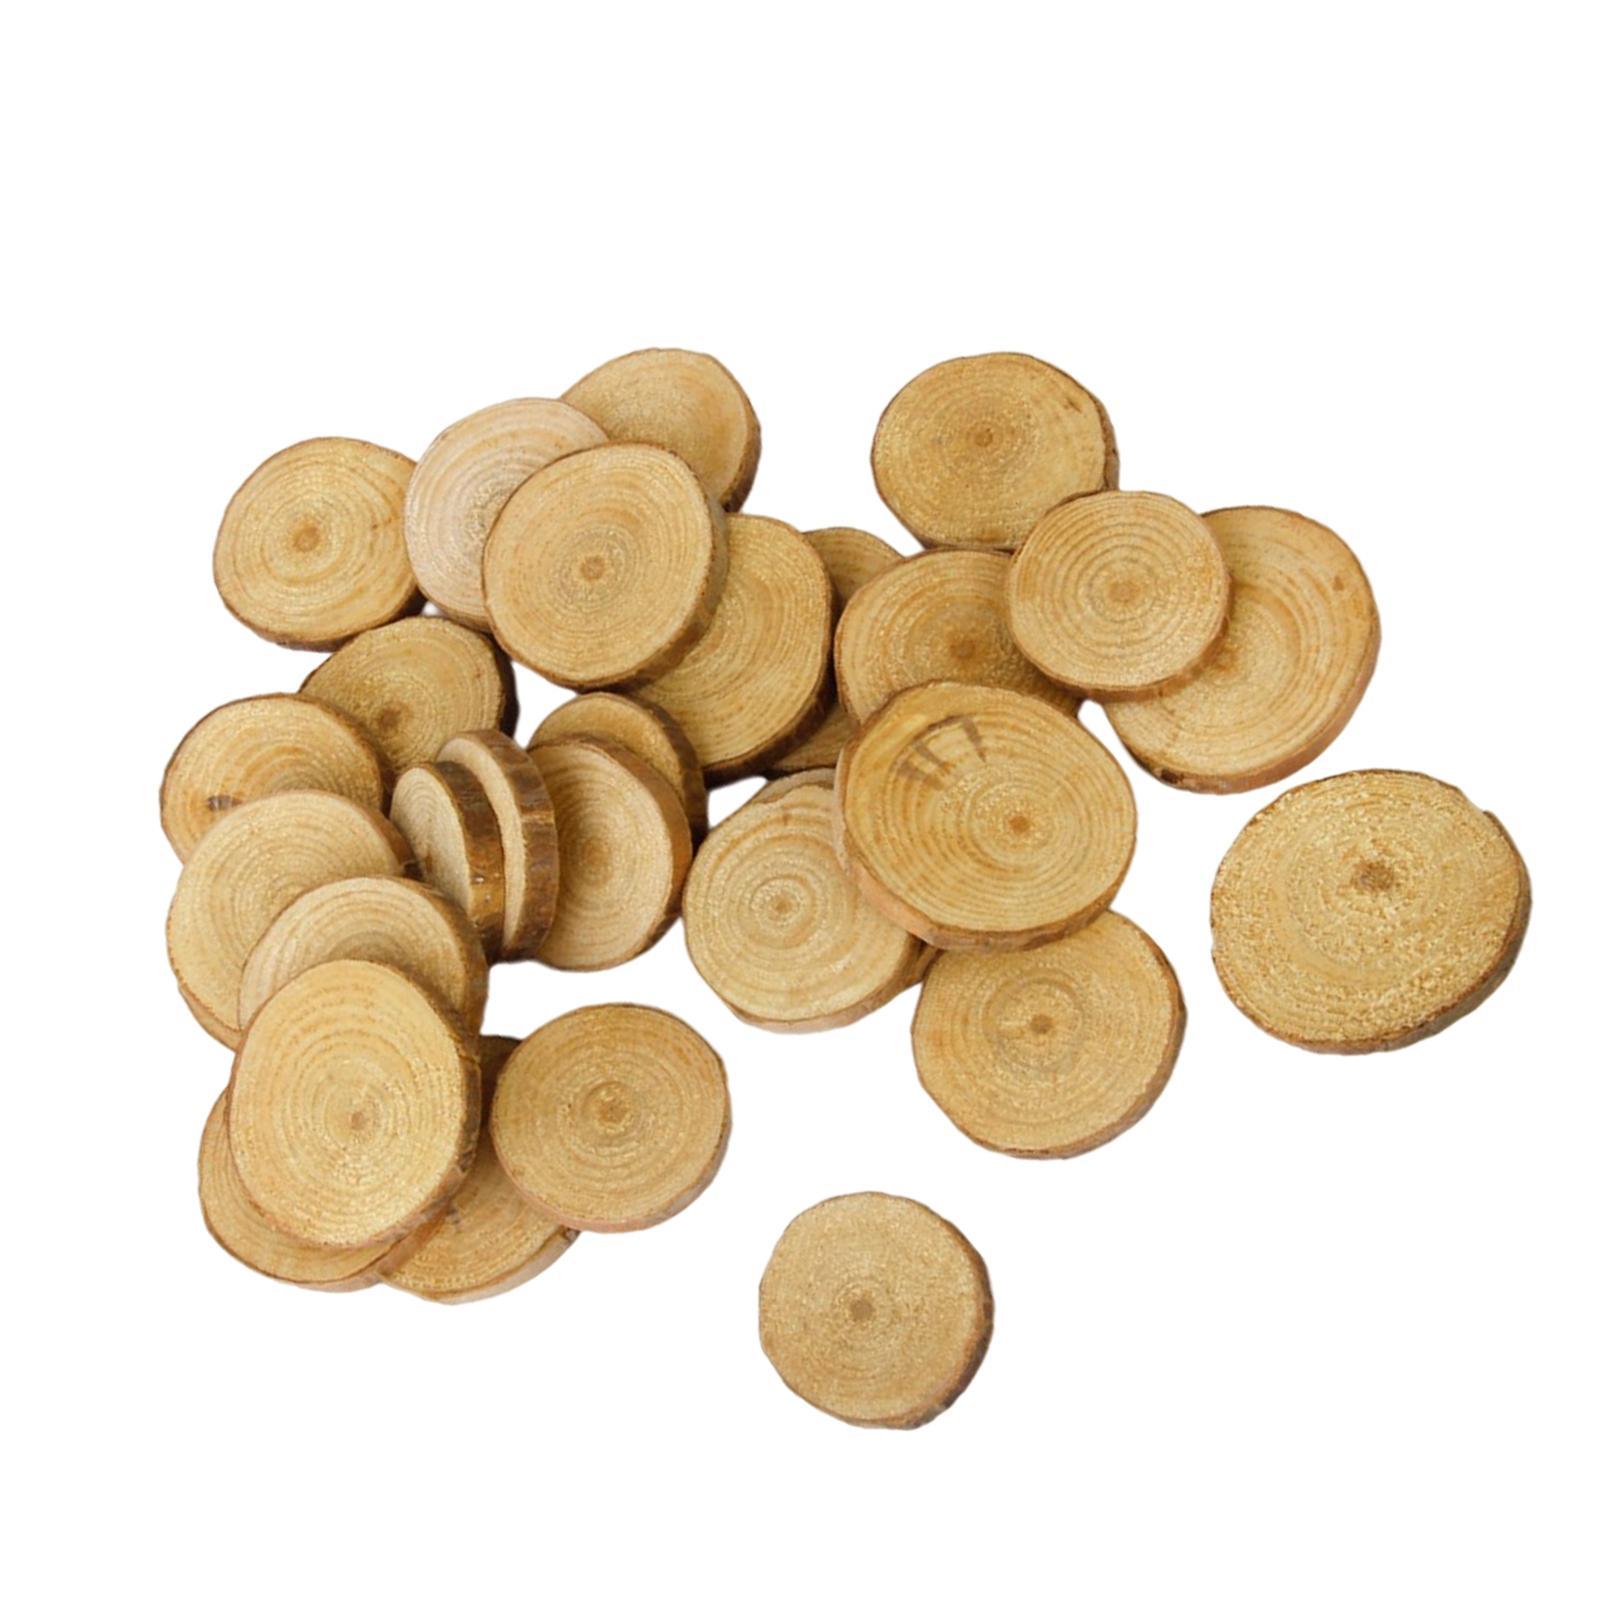 Phenovo Pine Wood Slices for DIY Crafts Wedding Decor 3-4cm 30pcs